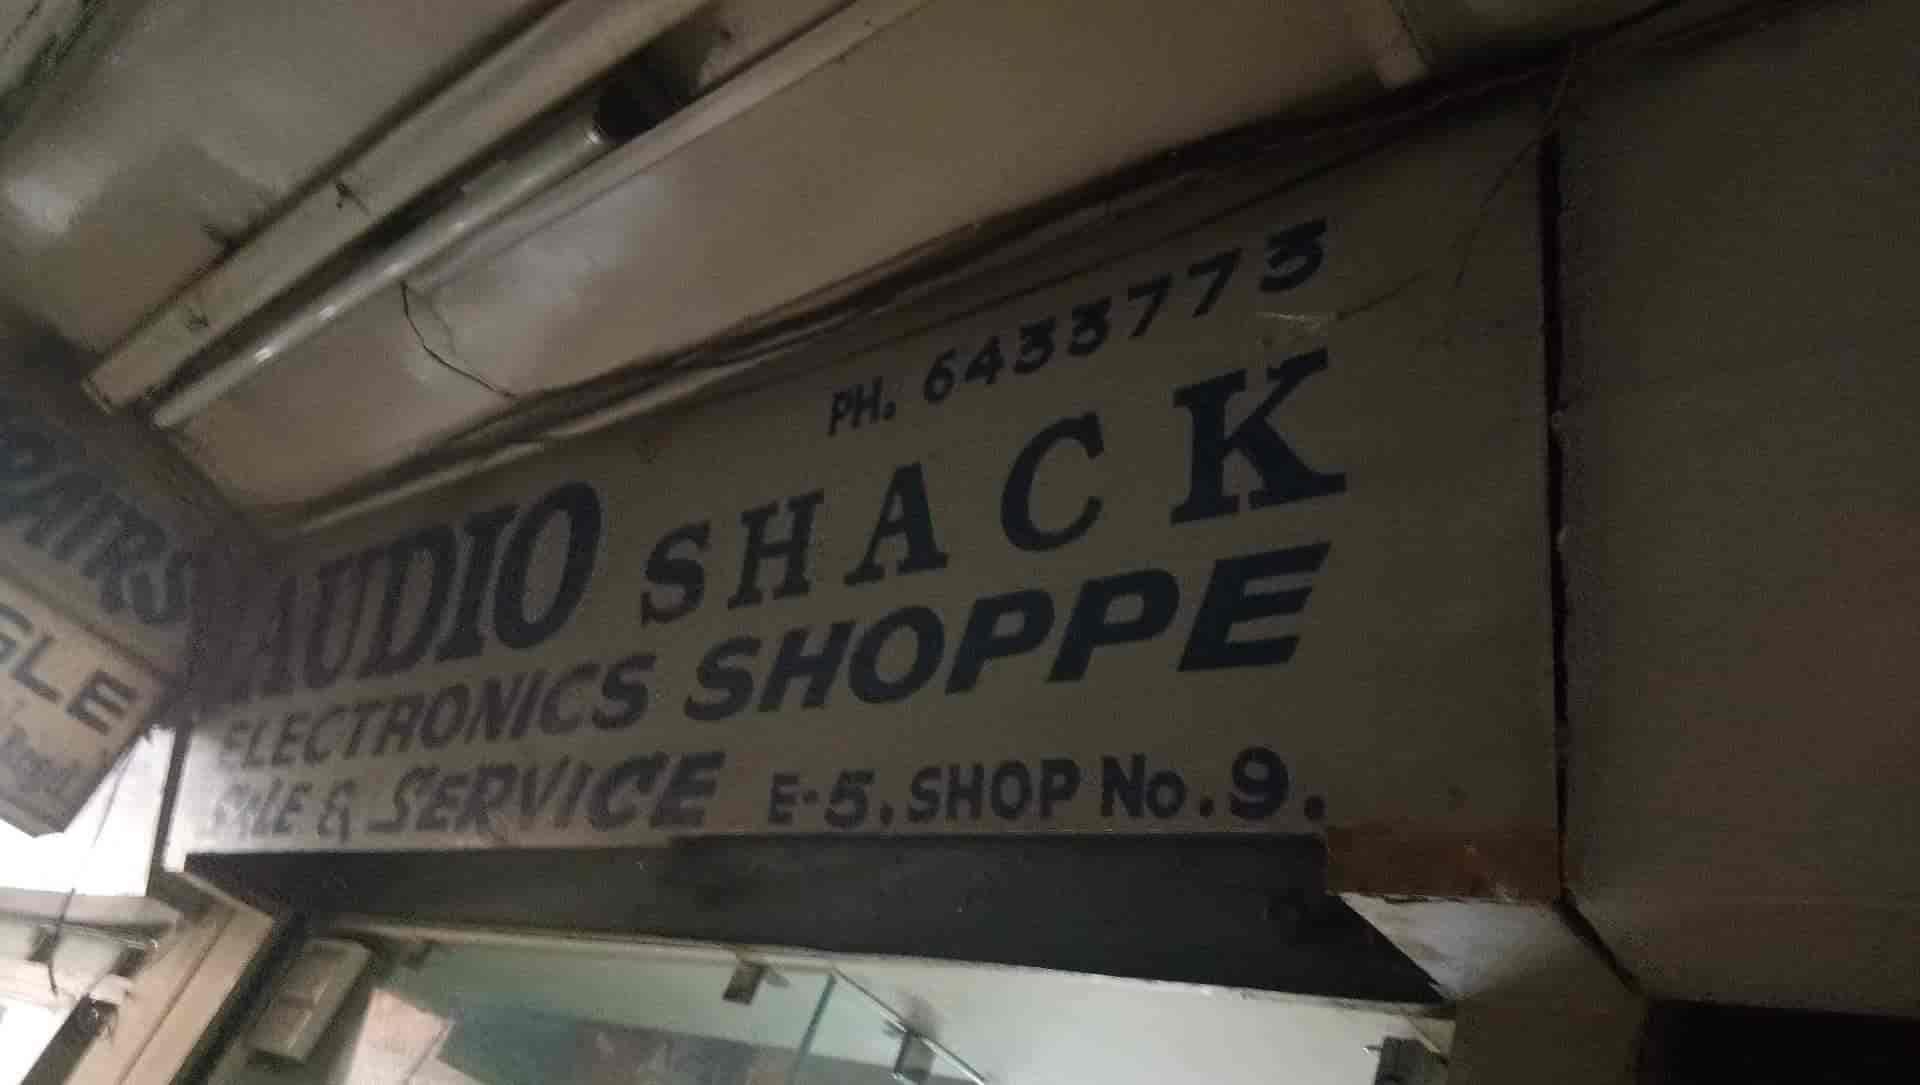 Audio Shack Electronics Shope Photos, Kalkaji, Delhi